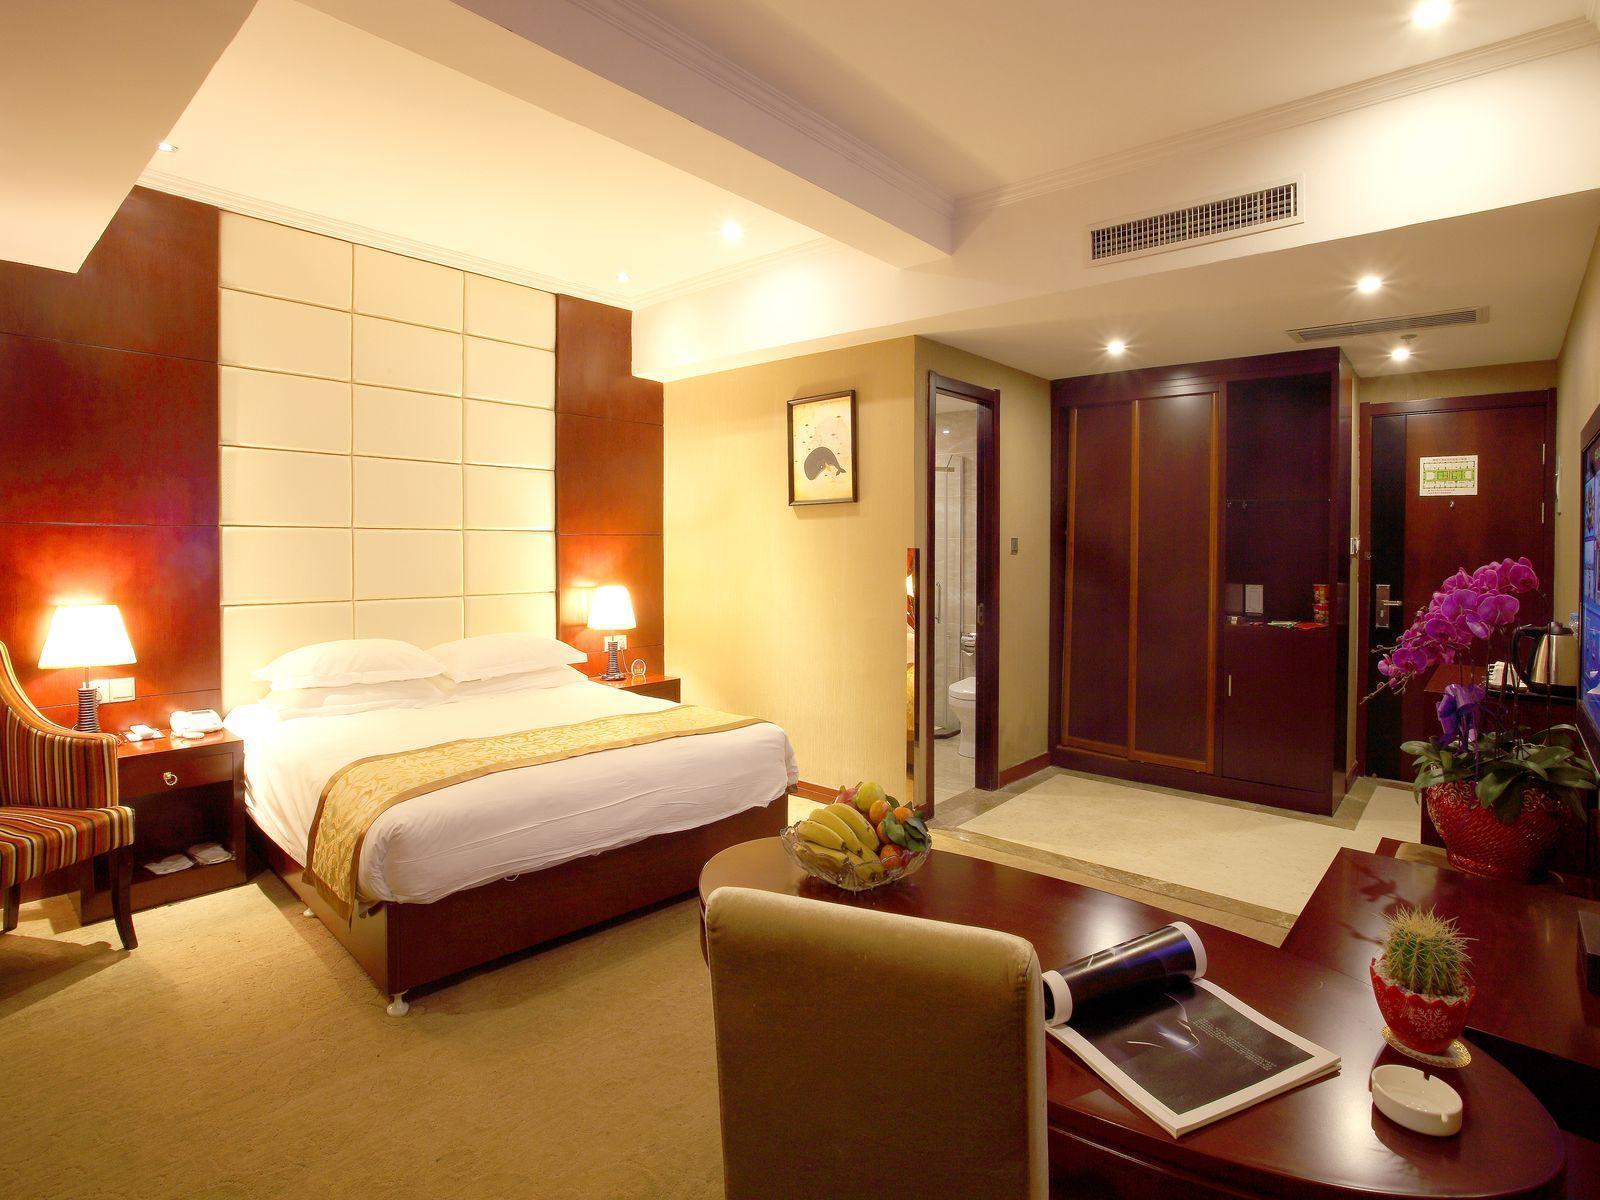 Promo Ray Gine Hotel Cheap Hotels Hangzhou China Kyme